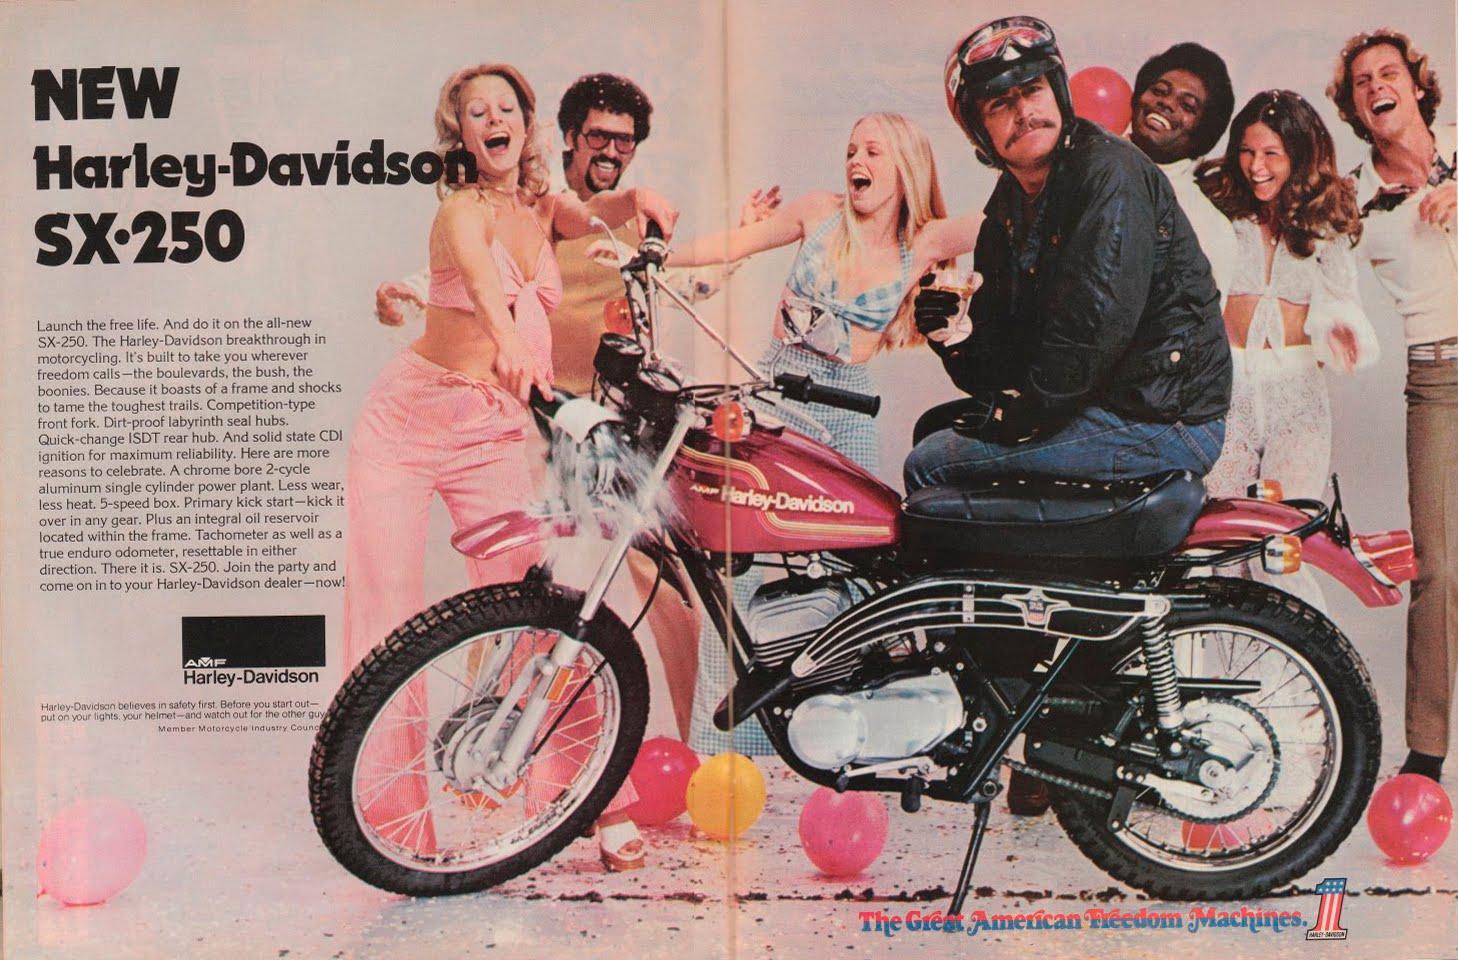 AFFICHES ANCIENNES ET PUBS H.D. - Page 6 Harley-Davidson_Aermacchi-SX250_1973_SIDEBURN